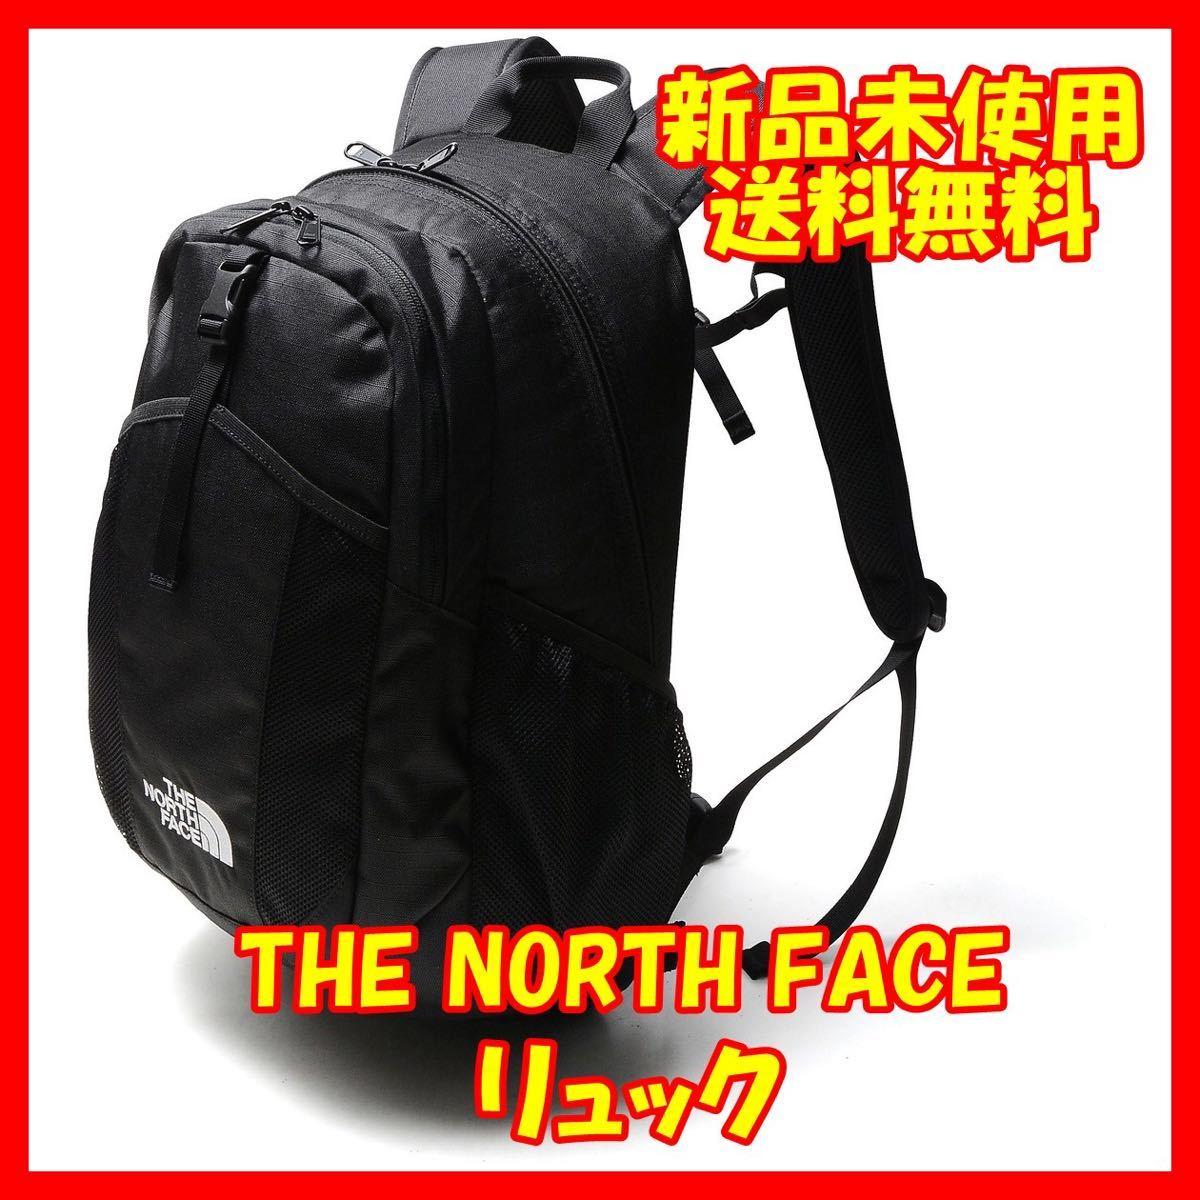 THE NORTH FACE (ノースフェイス) リュック バックパック